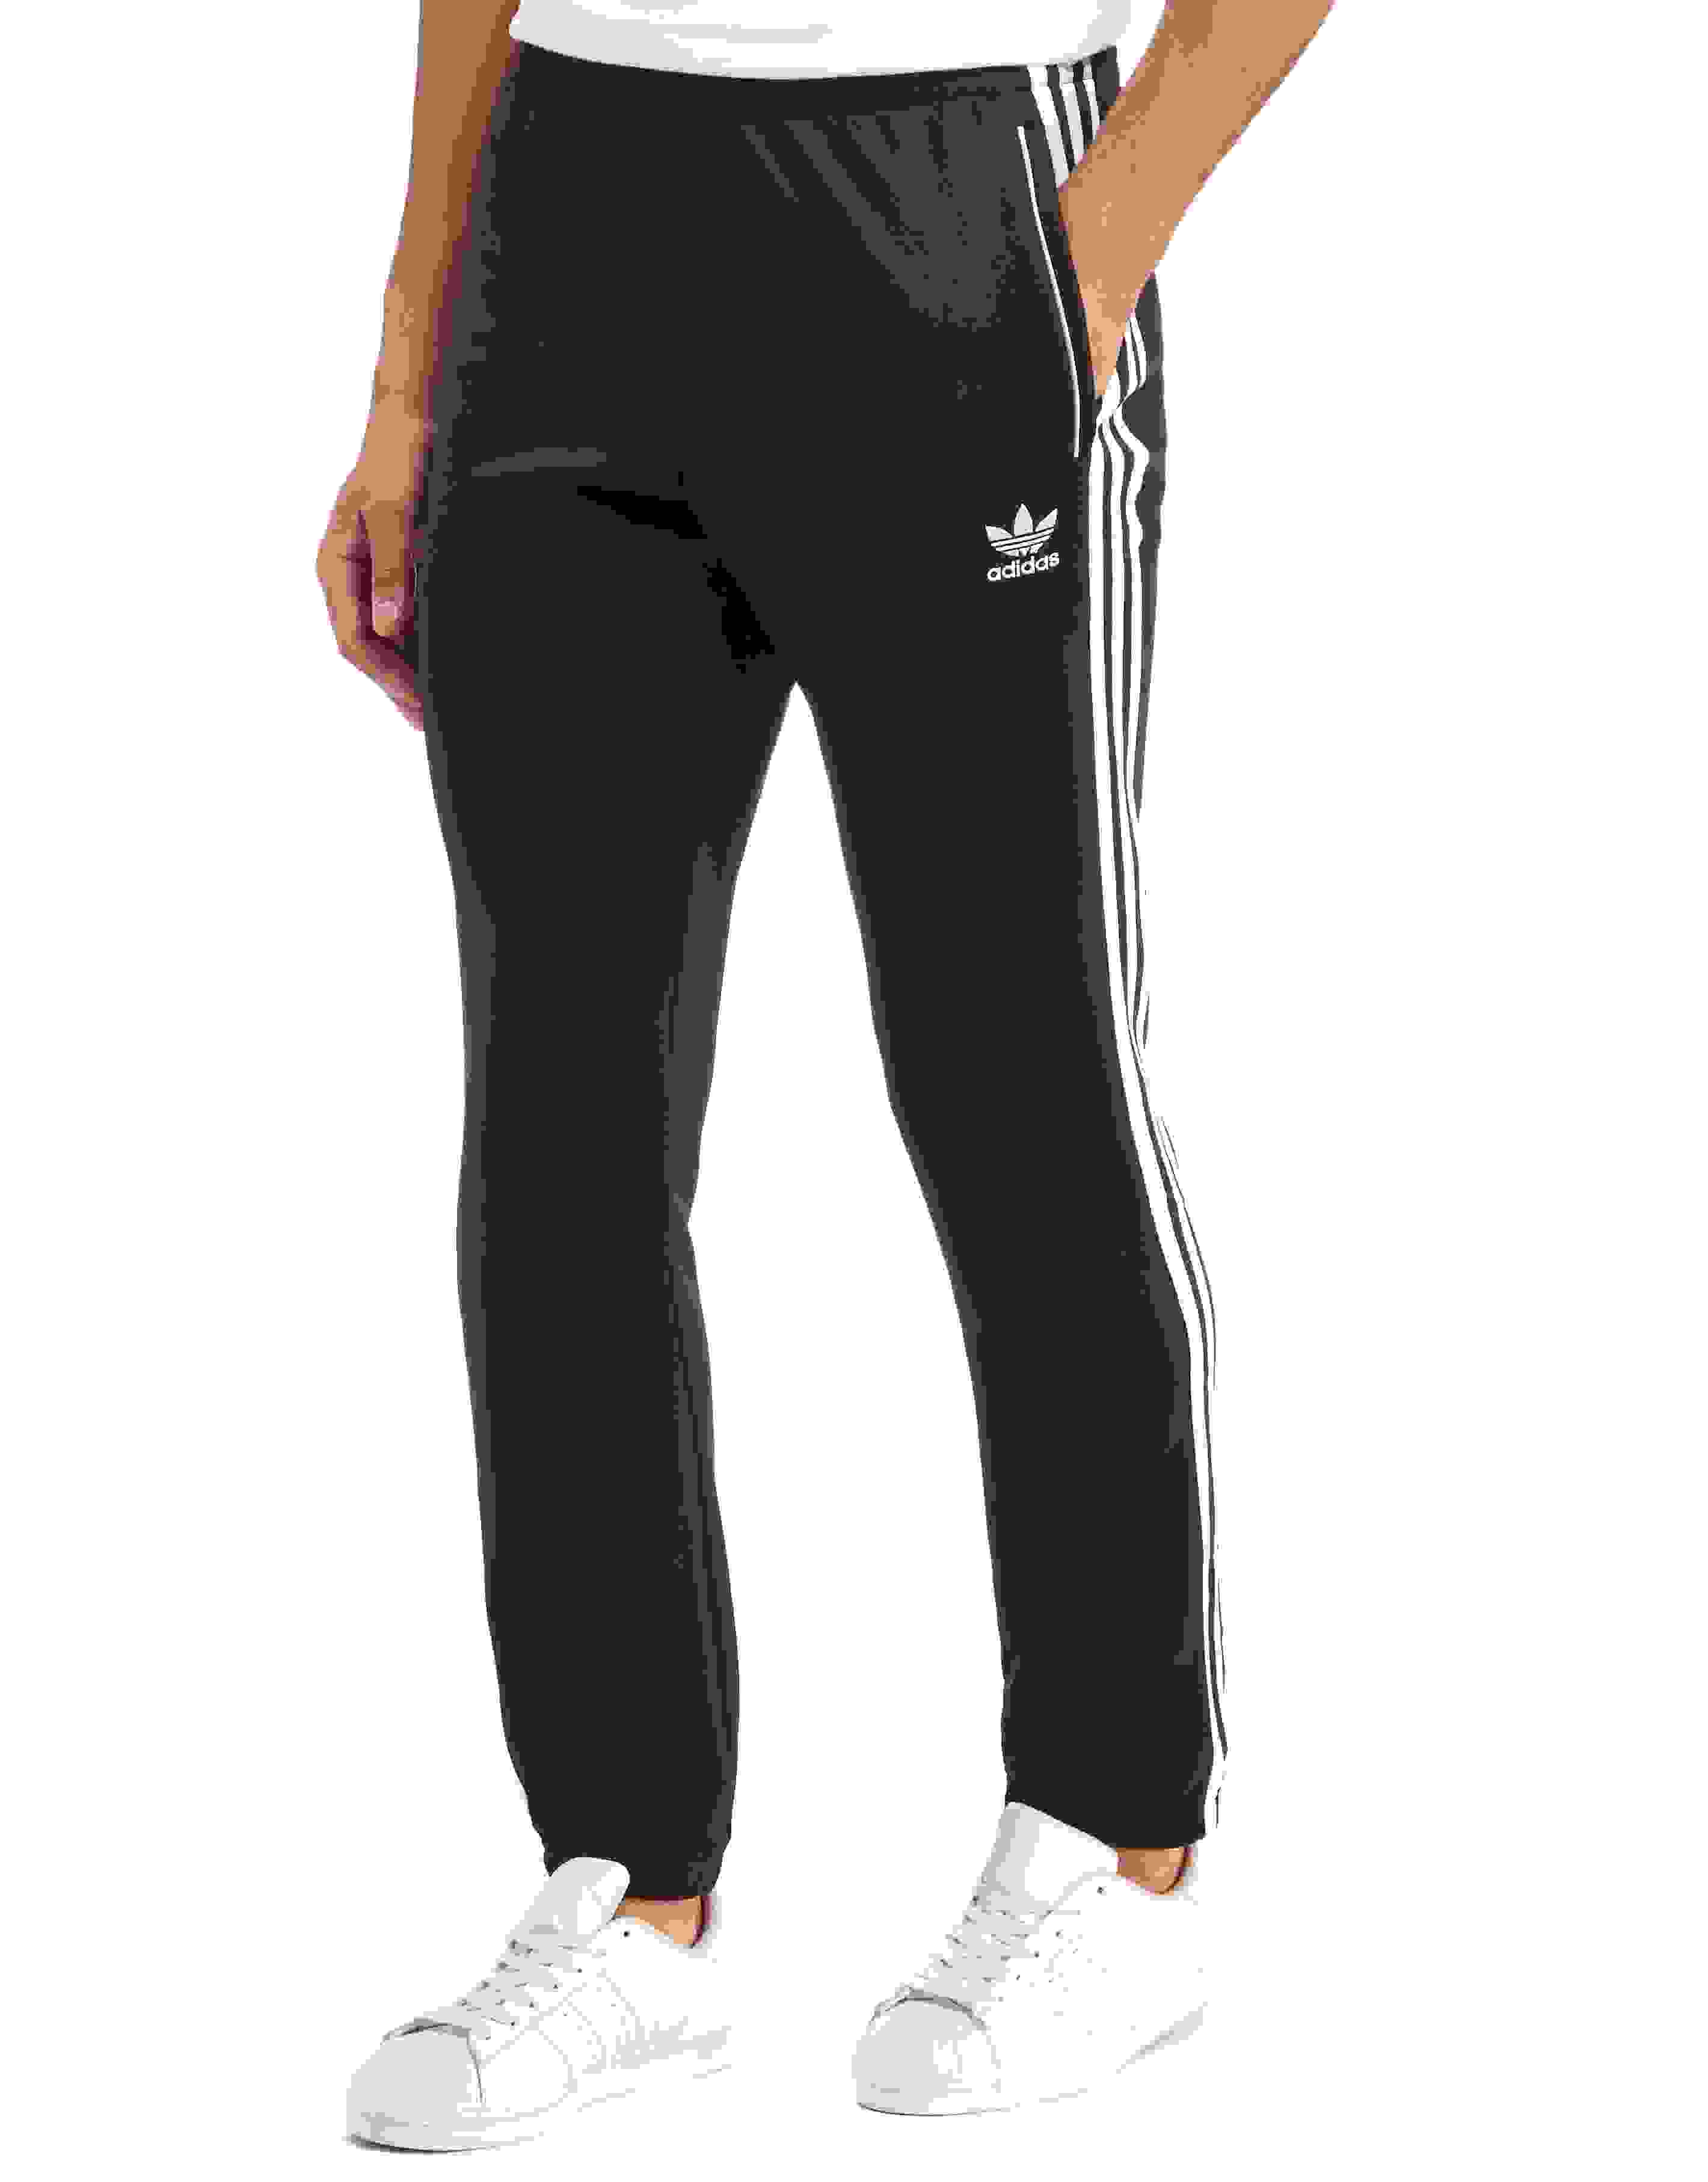 adidas 3 stripe pants. adidas originals 3-stripes superstar track pants 3 stripe s